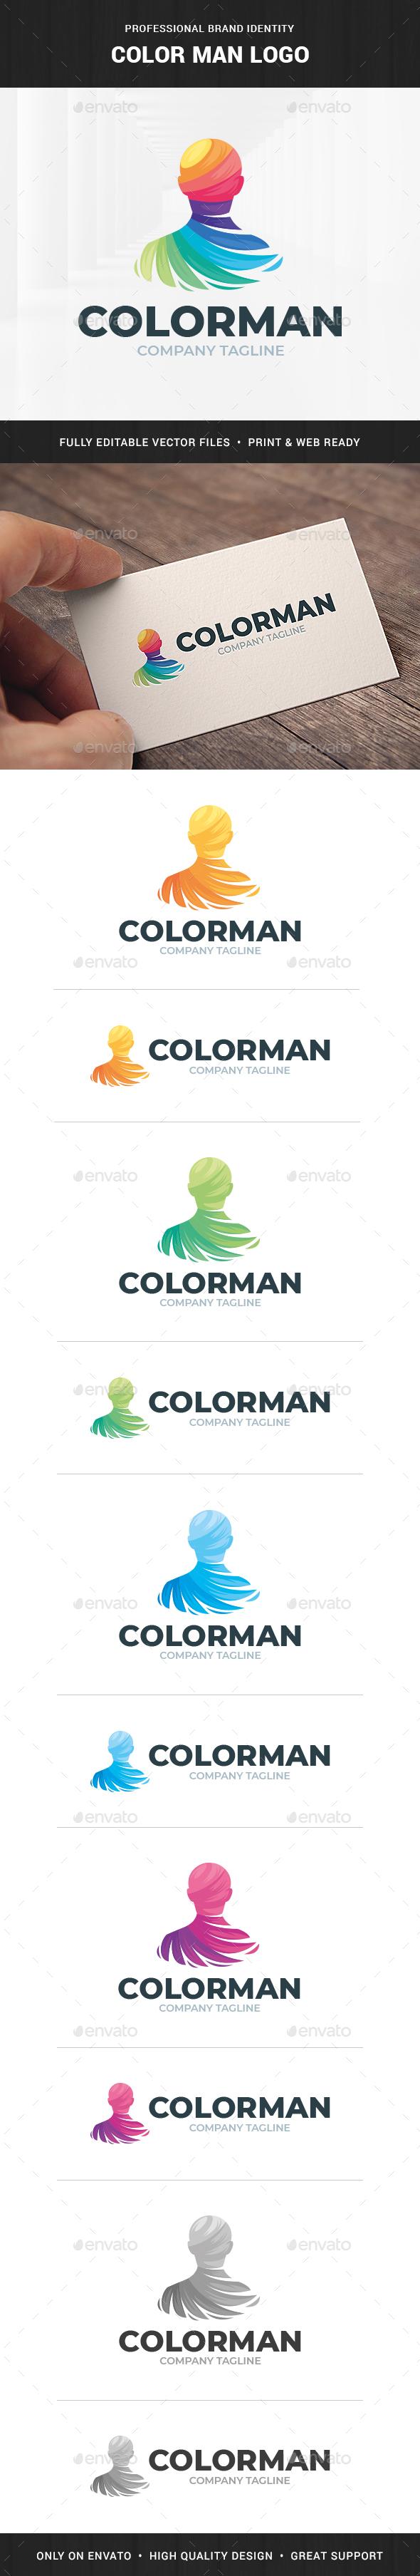 Color Man Logo Template